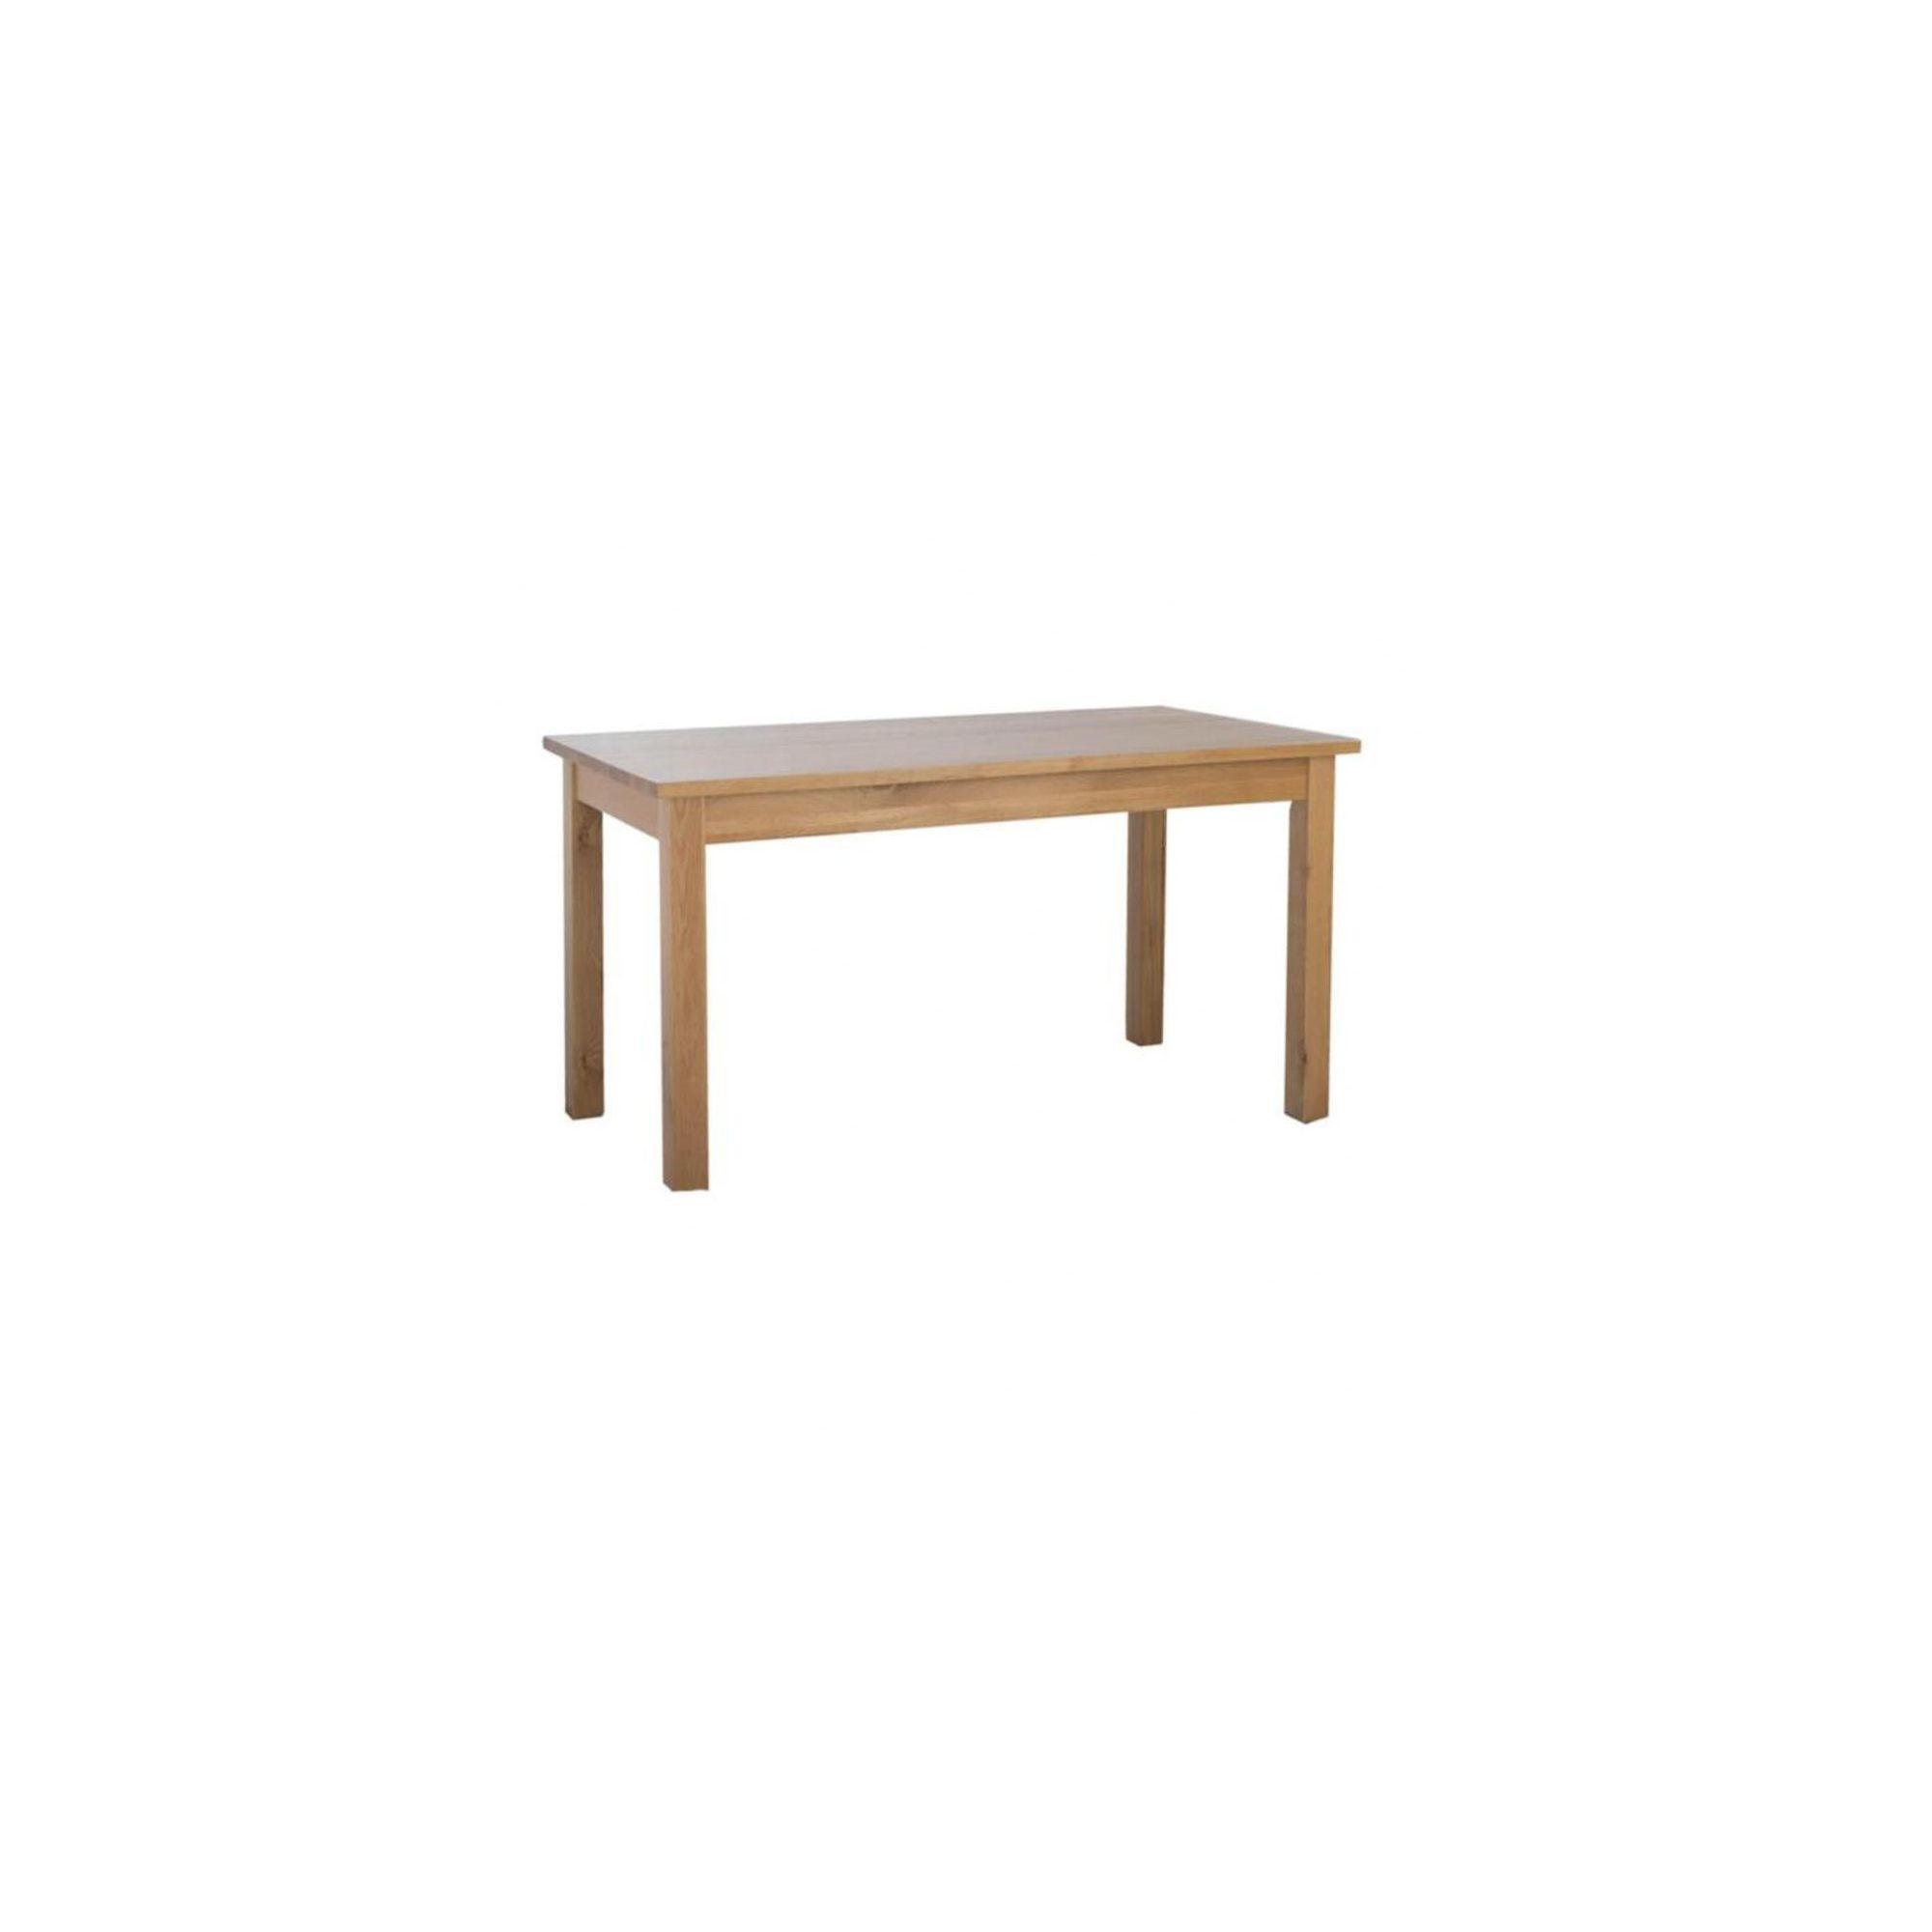 Oakinsen Balmain 150cm Dining Table